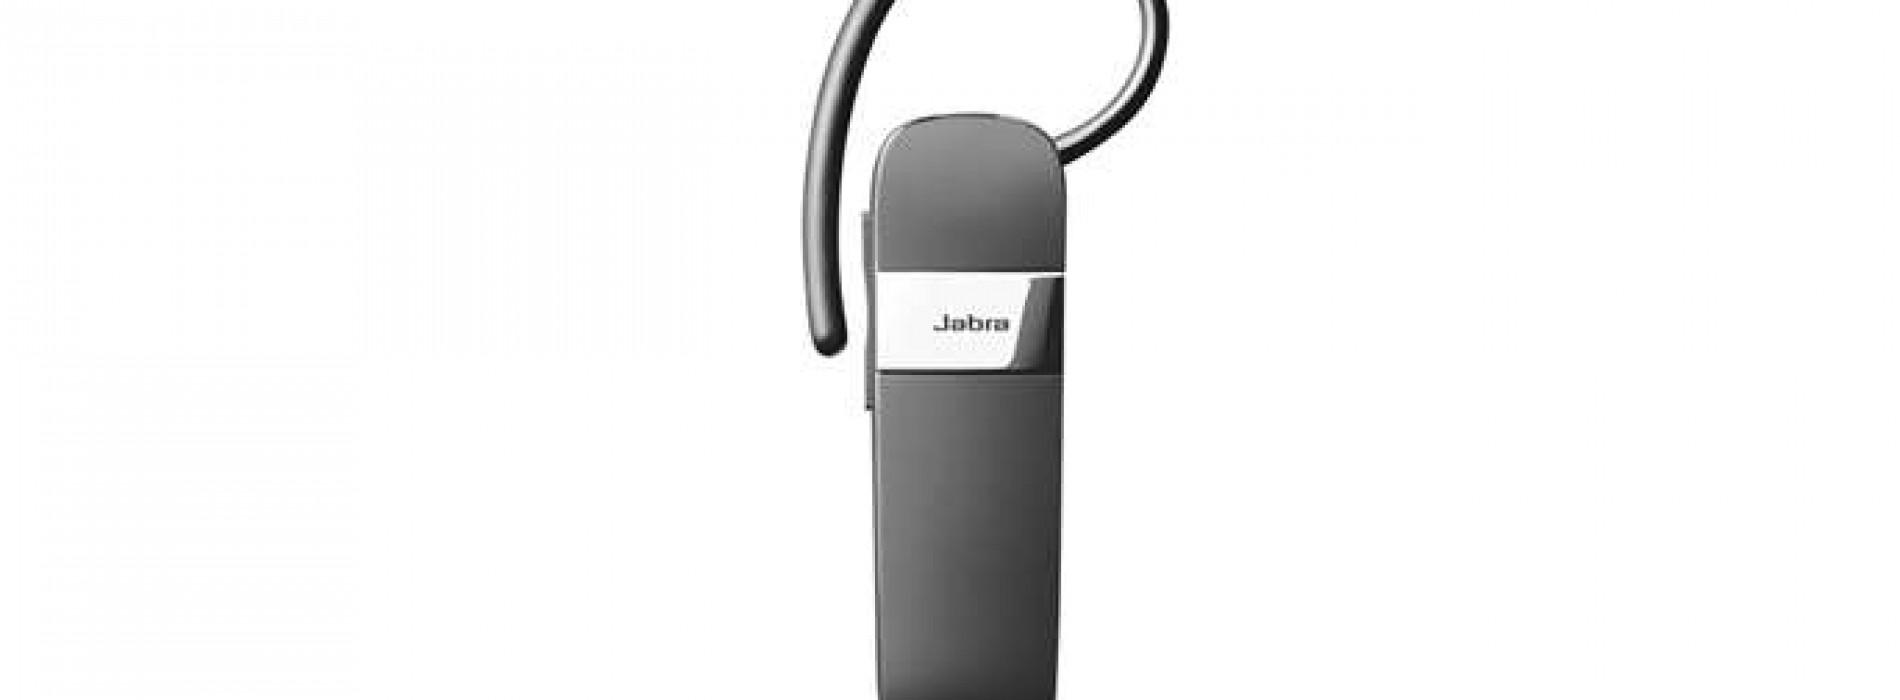 Jabra TALK BT Headset review